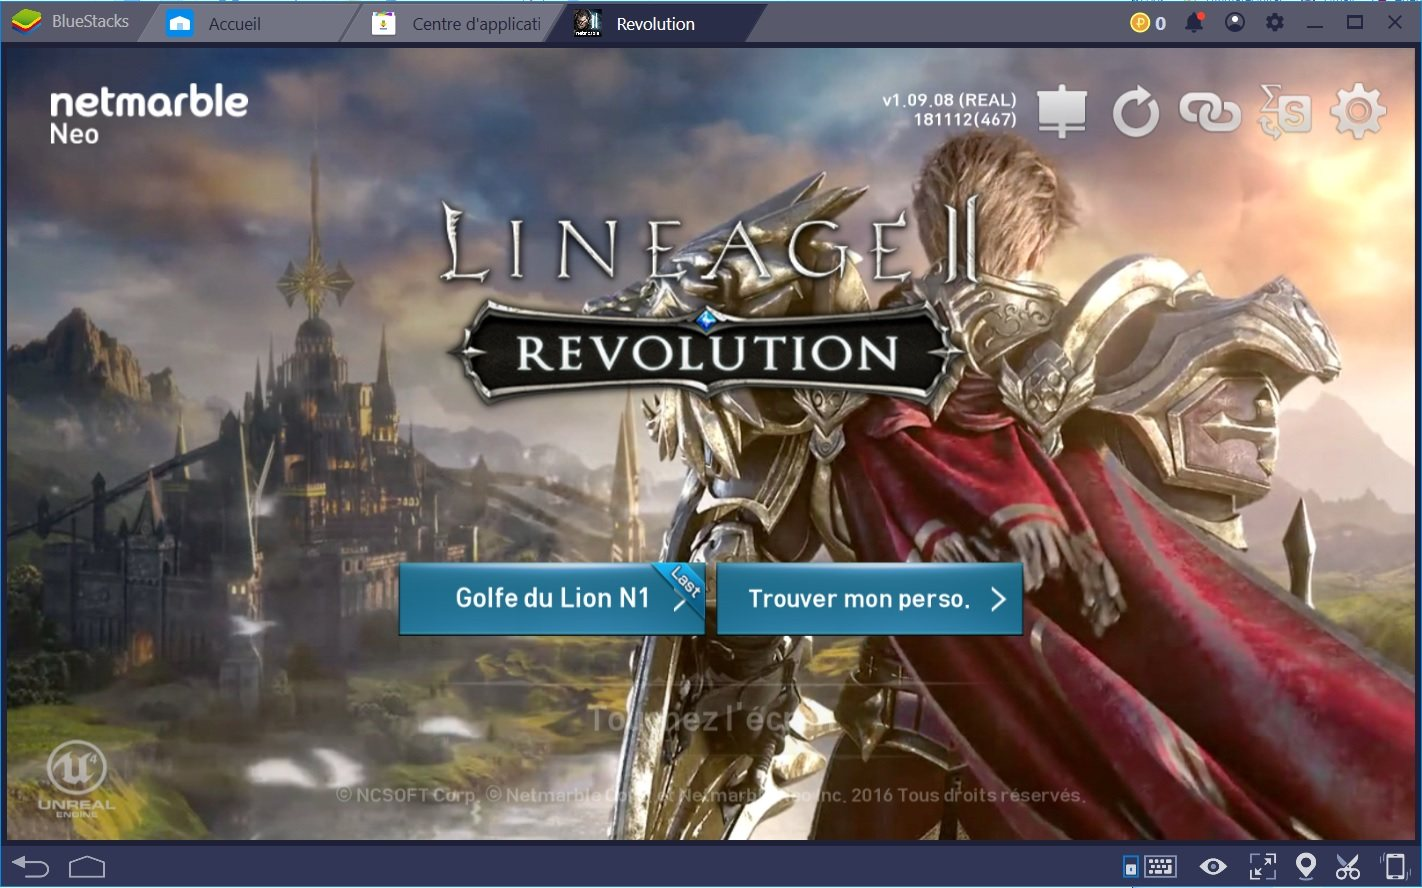 Plus de fun dans Lineage 2 : Revolution grâce au Combo Key de BlueStacks